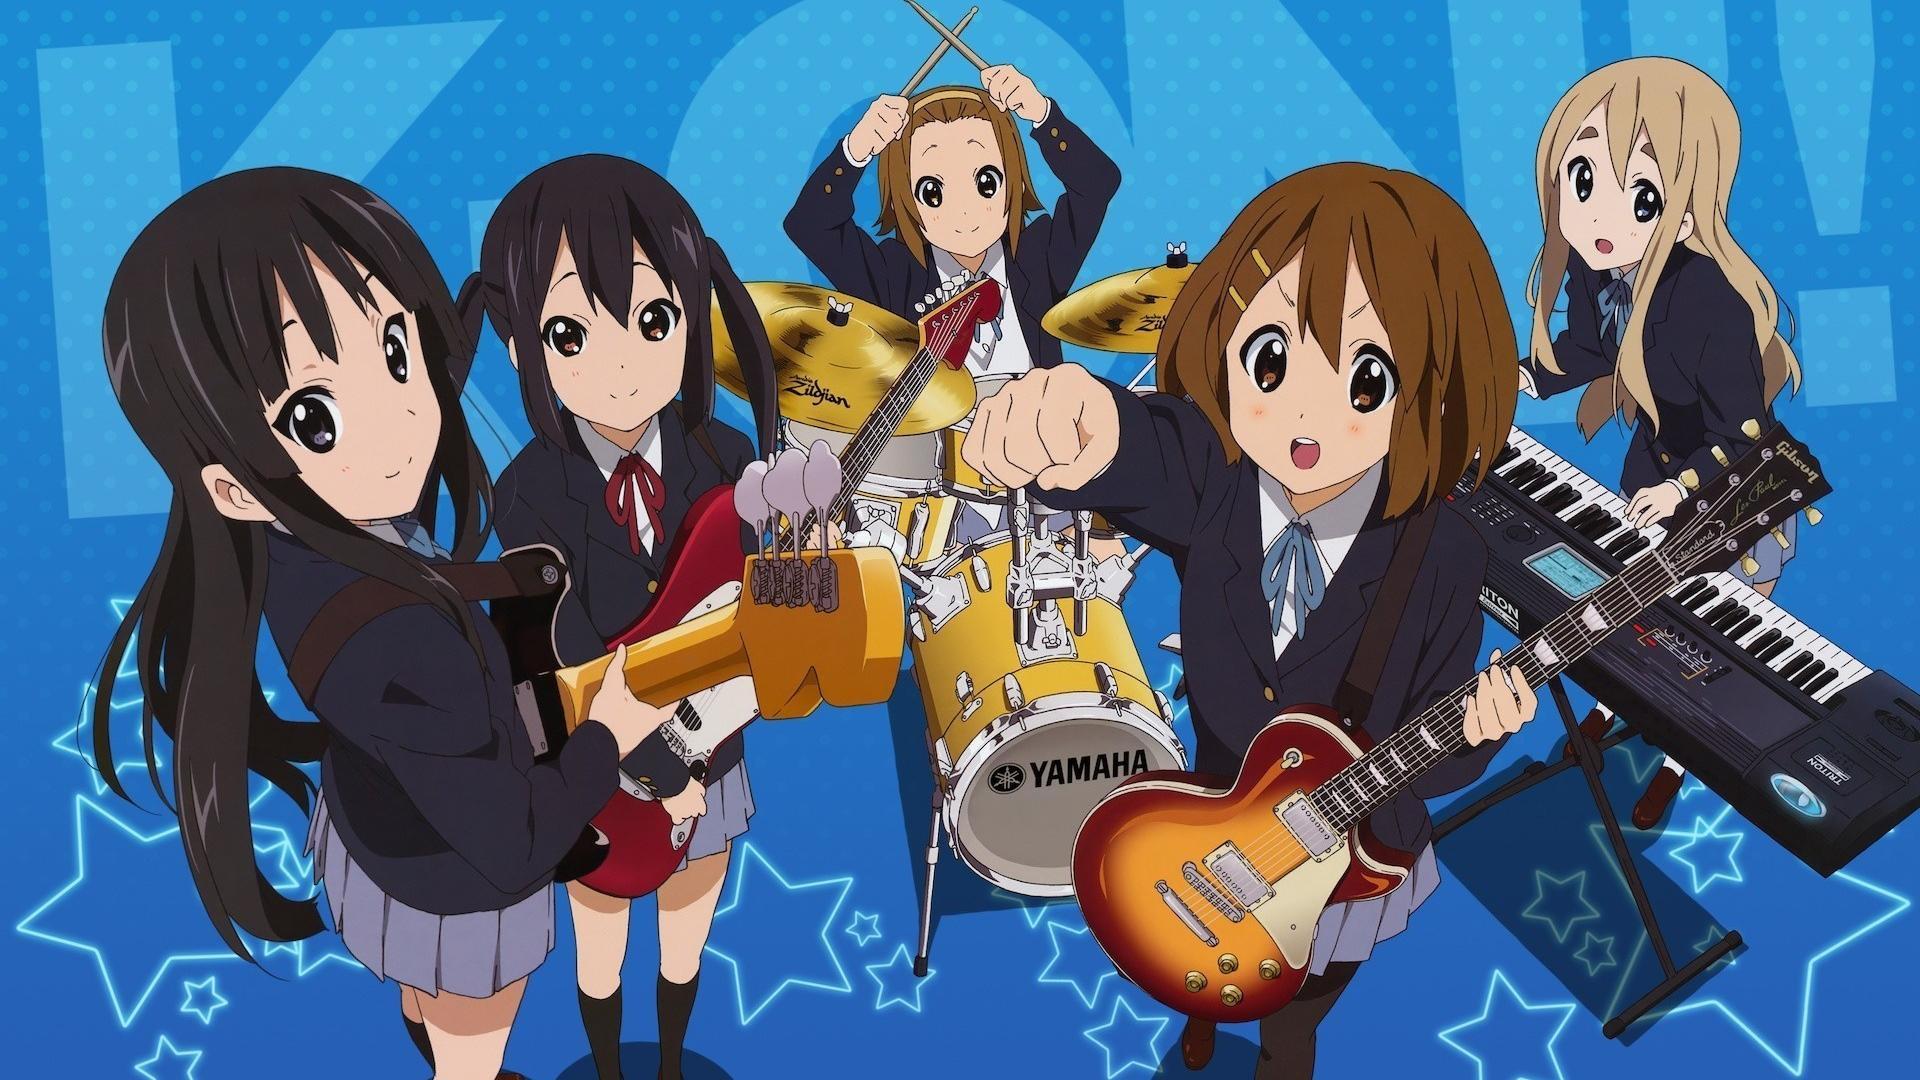 Anime K-ON!